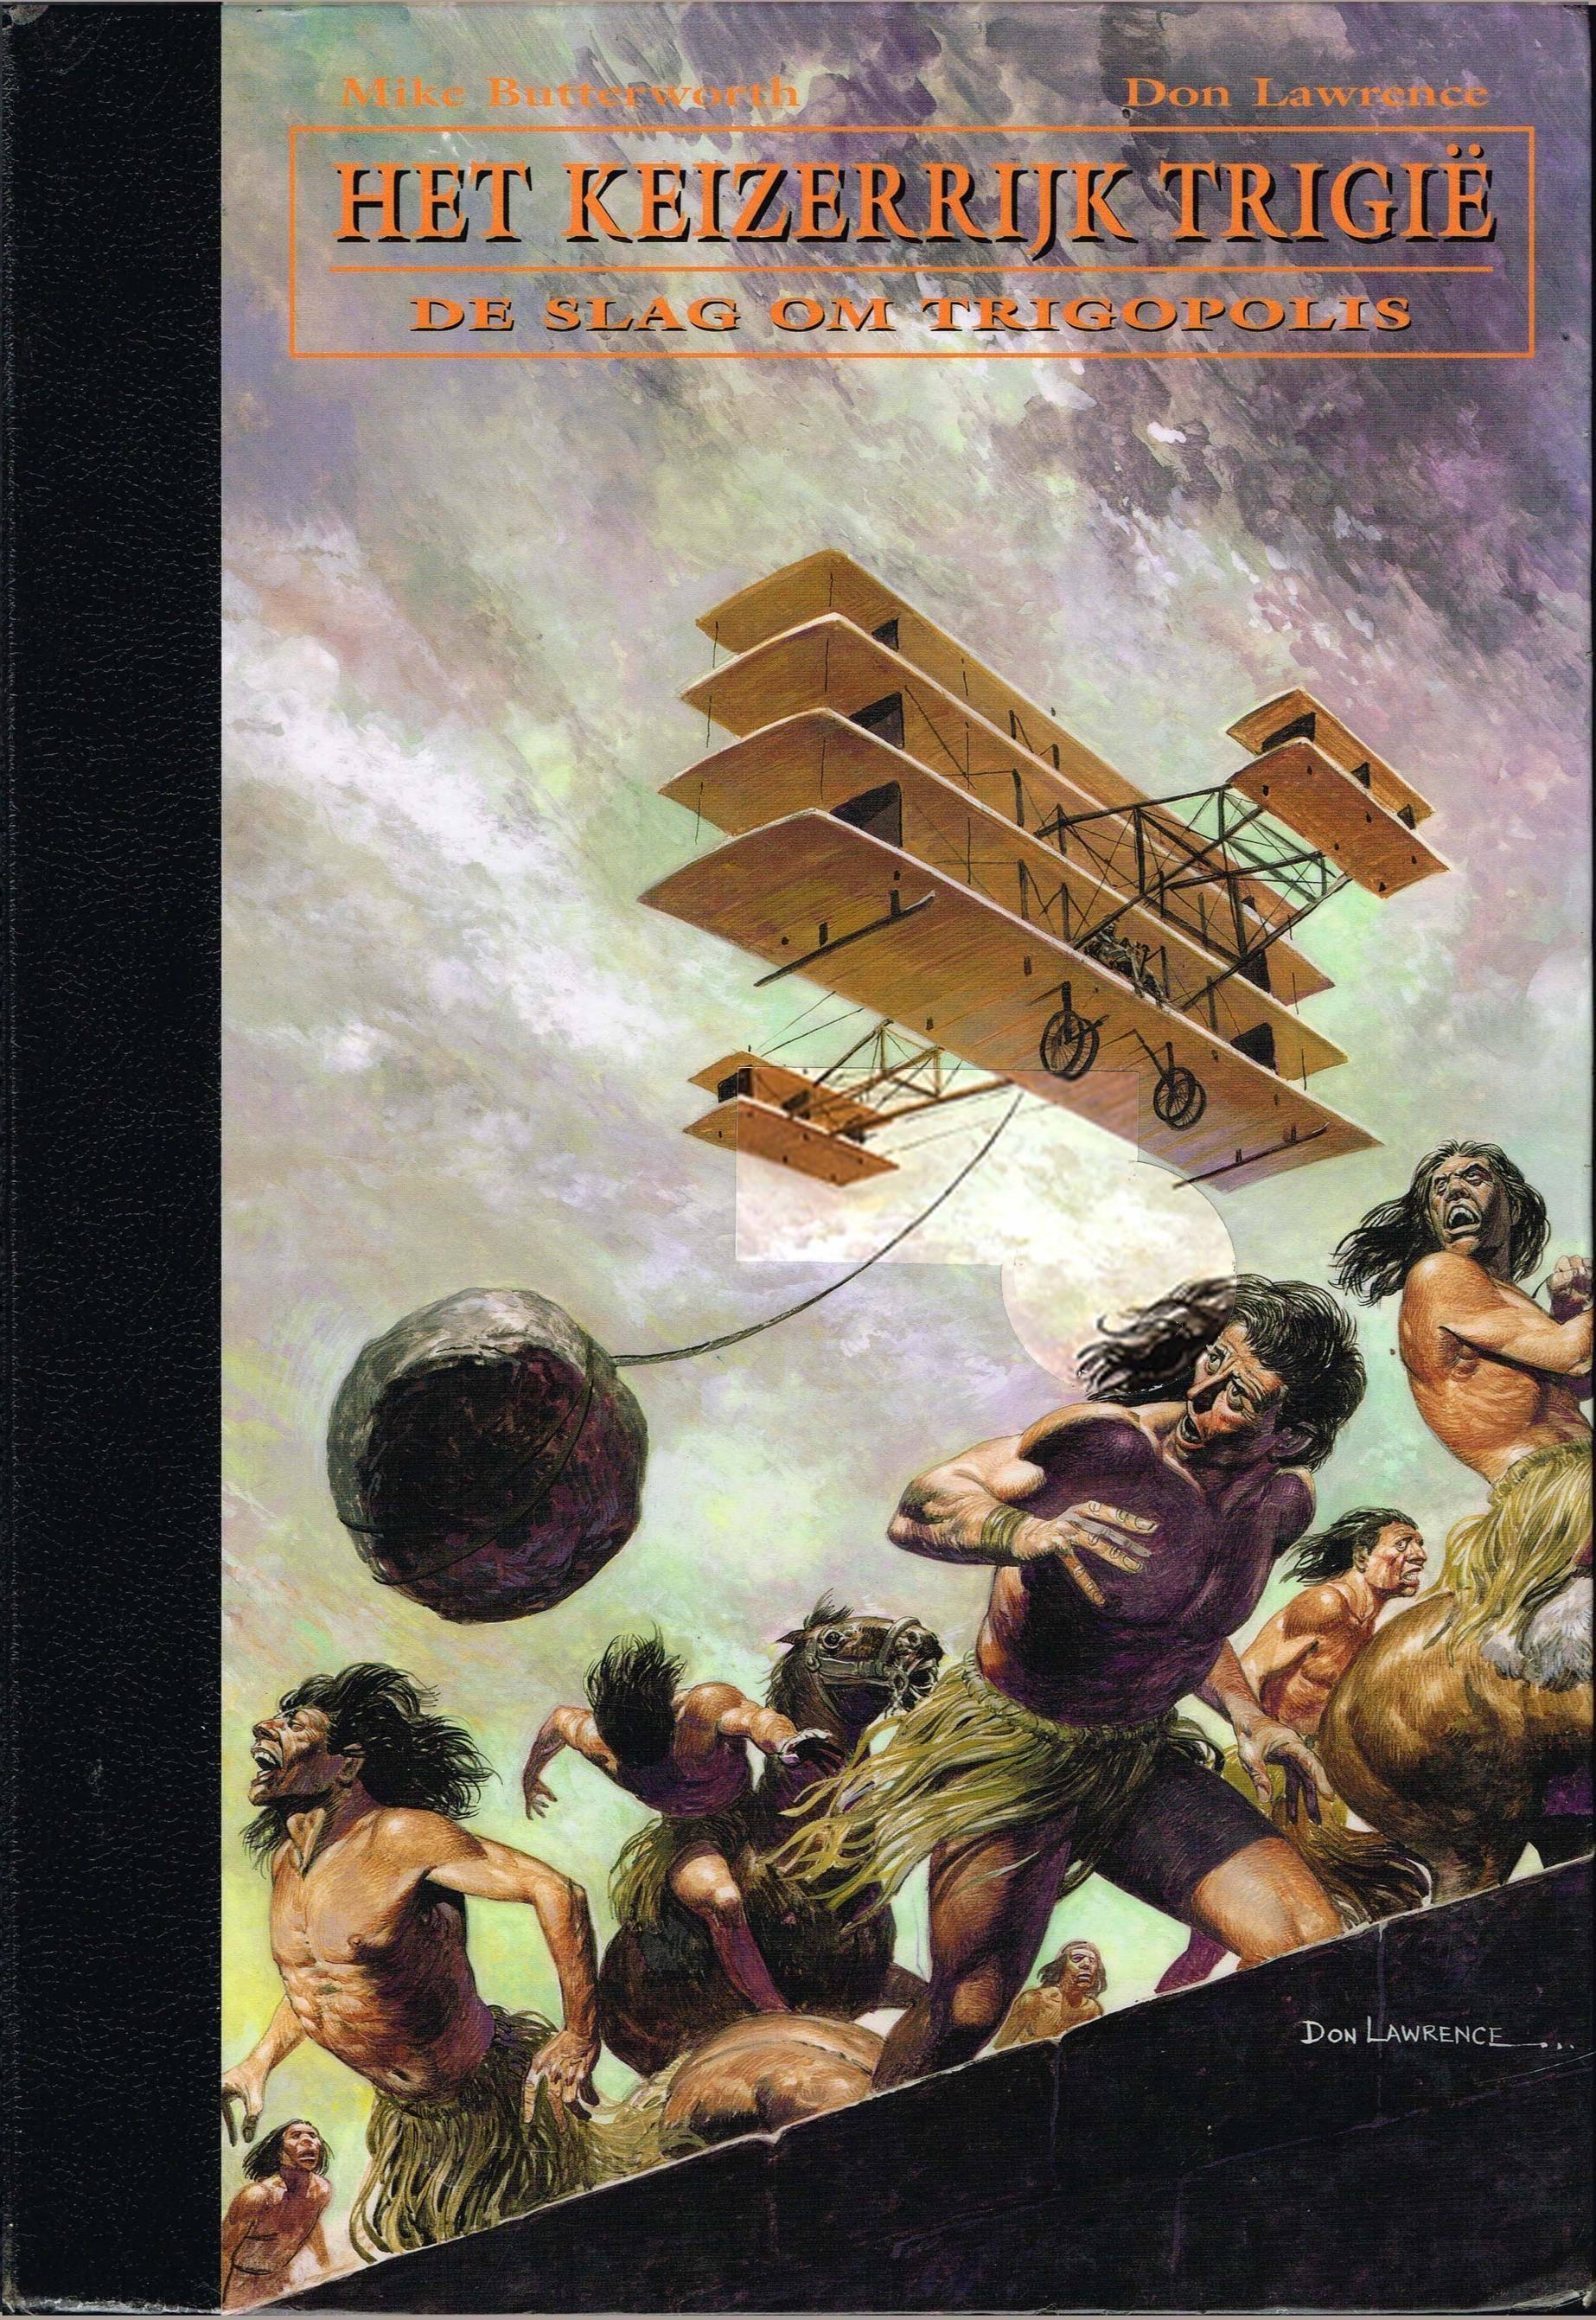 Aanvulling - Trigie The Collection - 03 - Slag Om Trigopolis cbr par2